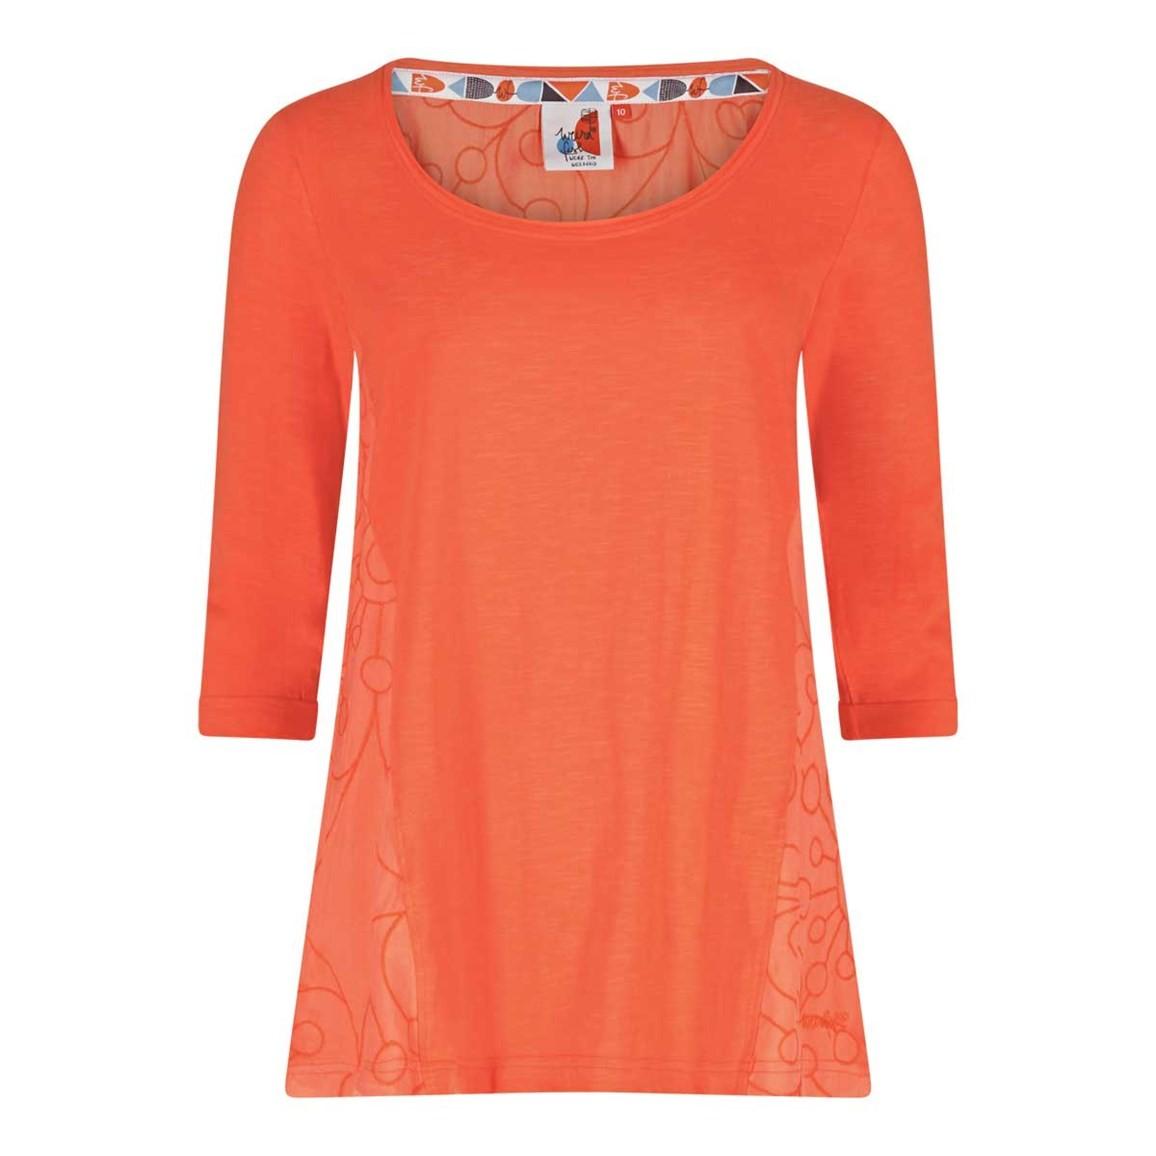 Weird Fish Saffron 3/4 Sleeve Embroidered T-Shirt Clementine Size 10